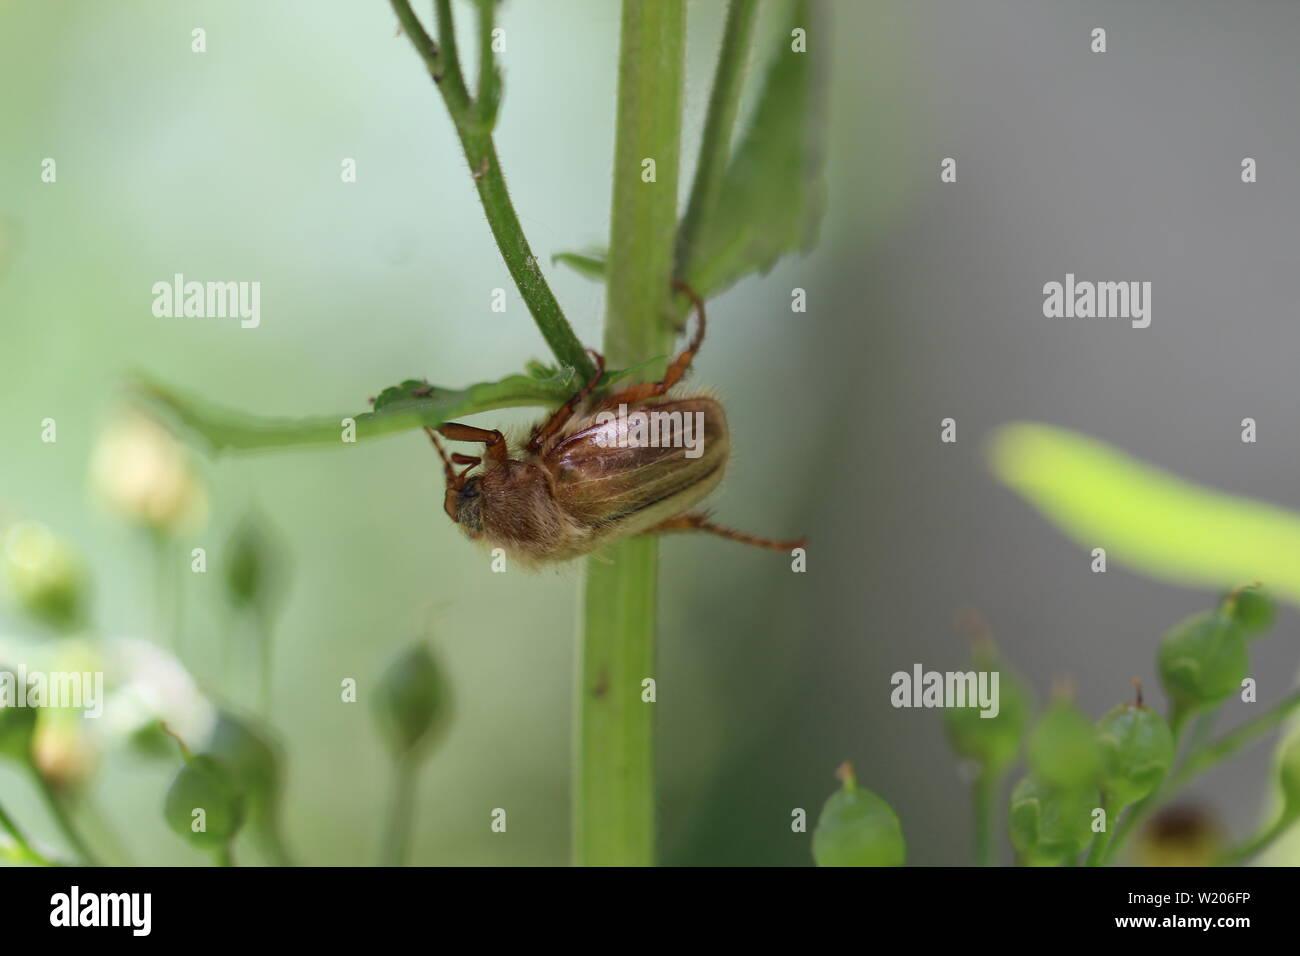 Maikäfer im Garten Stock Photo